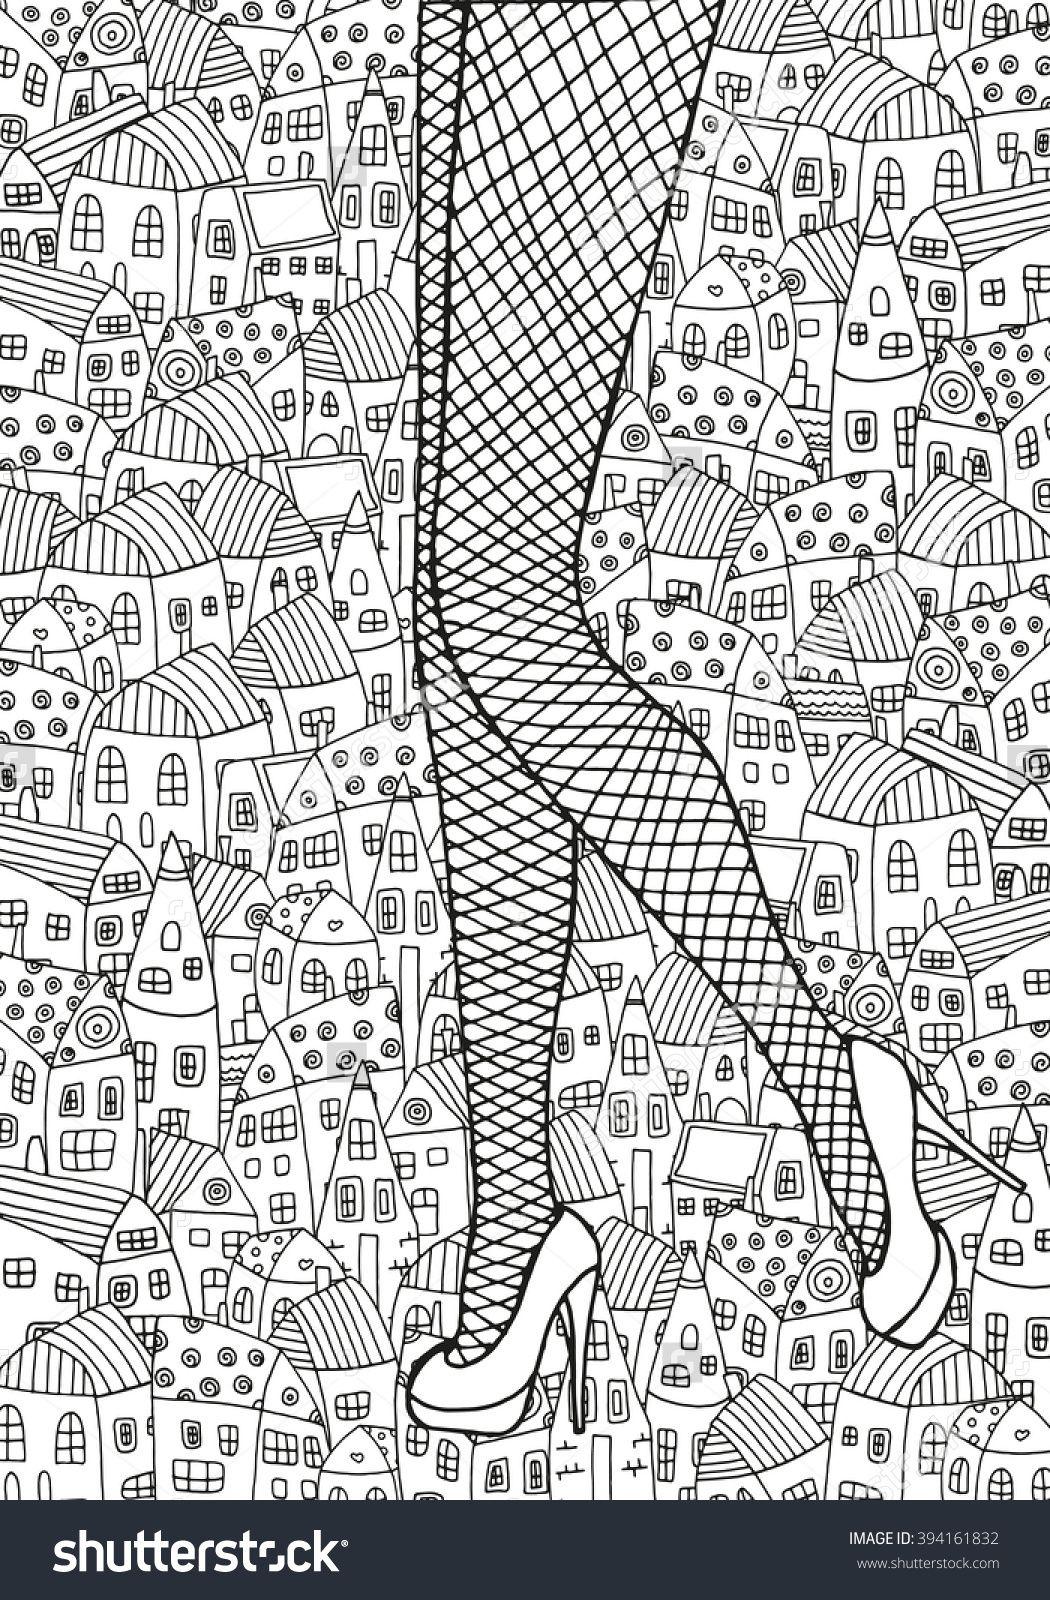 Female legs in fishnet stockings, houses background | Zeichnen ...